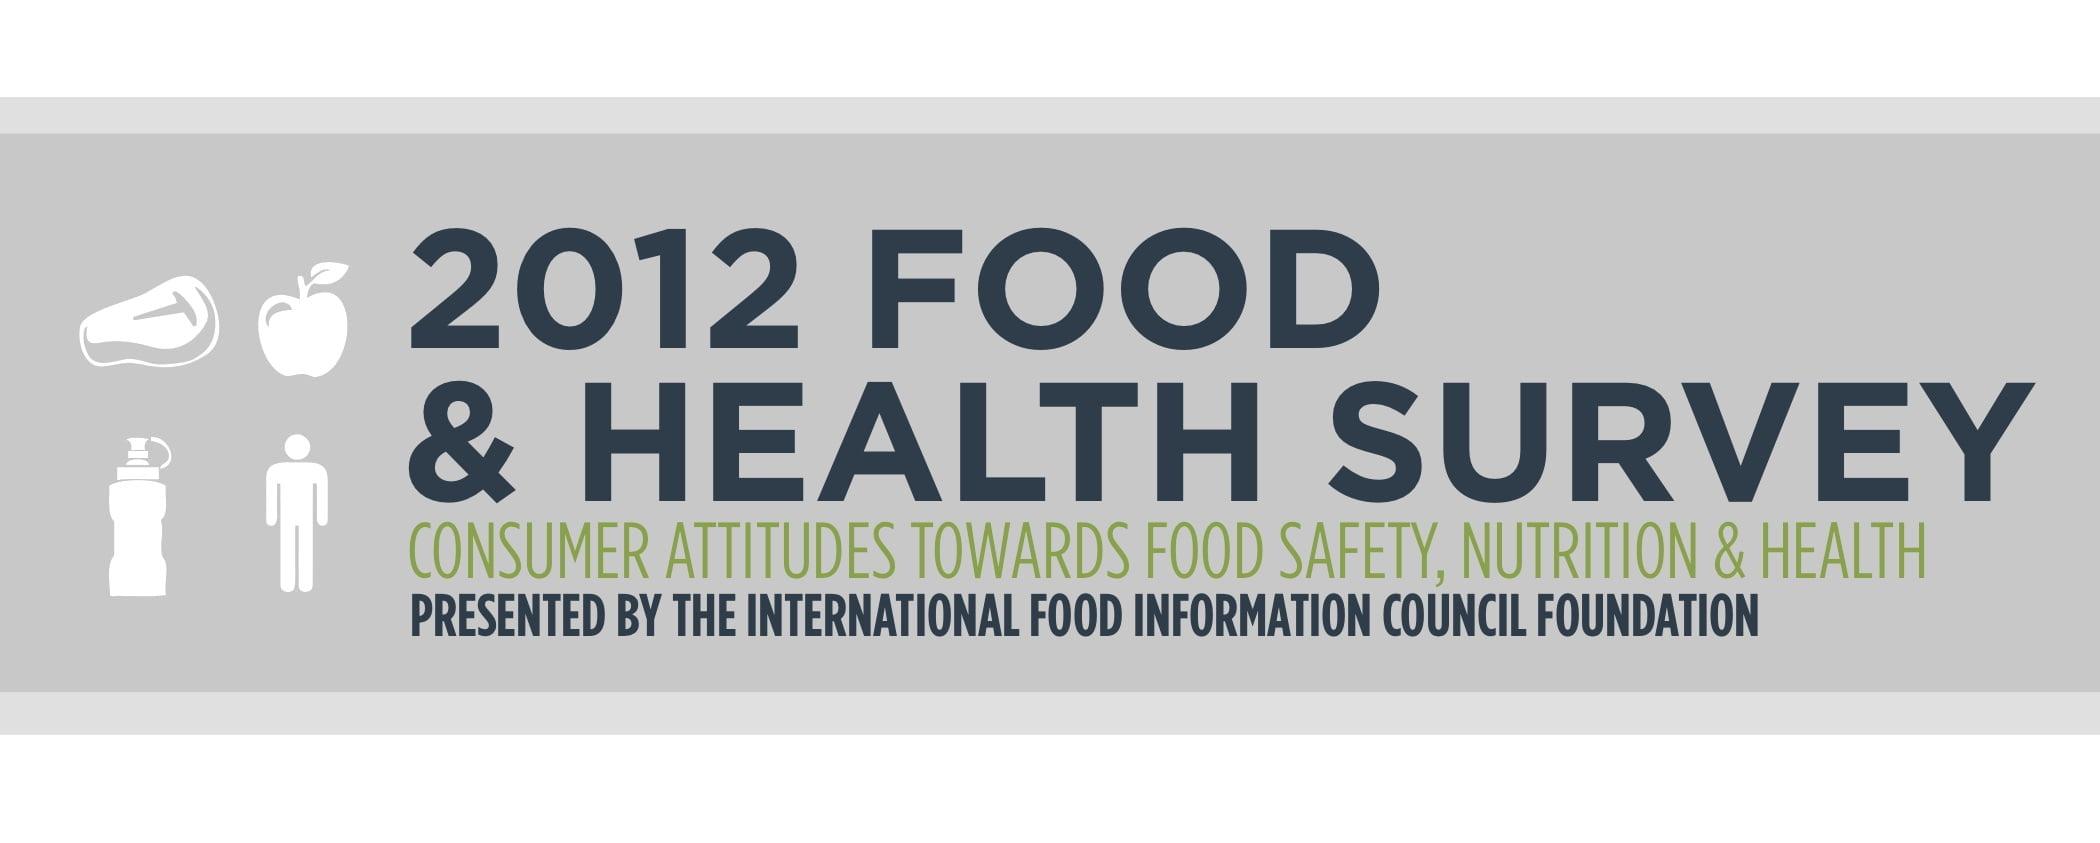 2012 Food & Health Survey: Consumer Attitudes toward Food